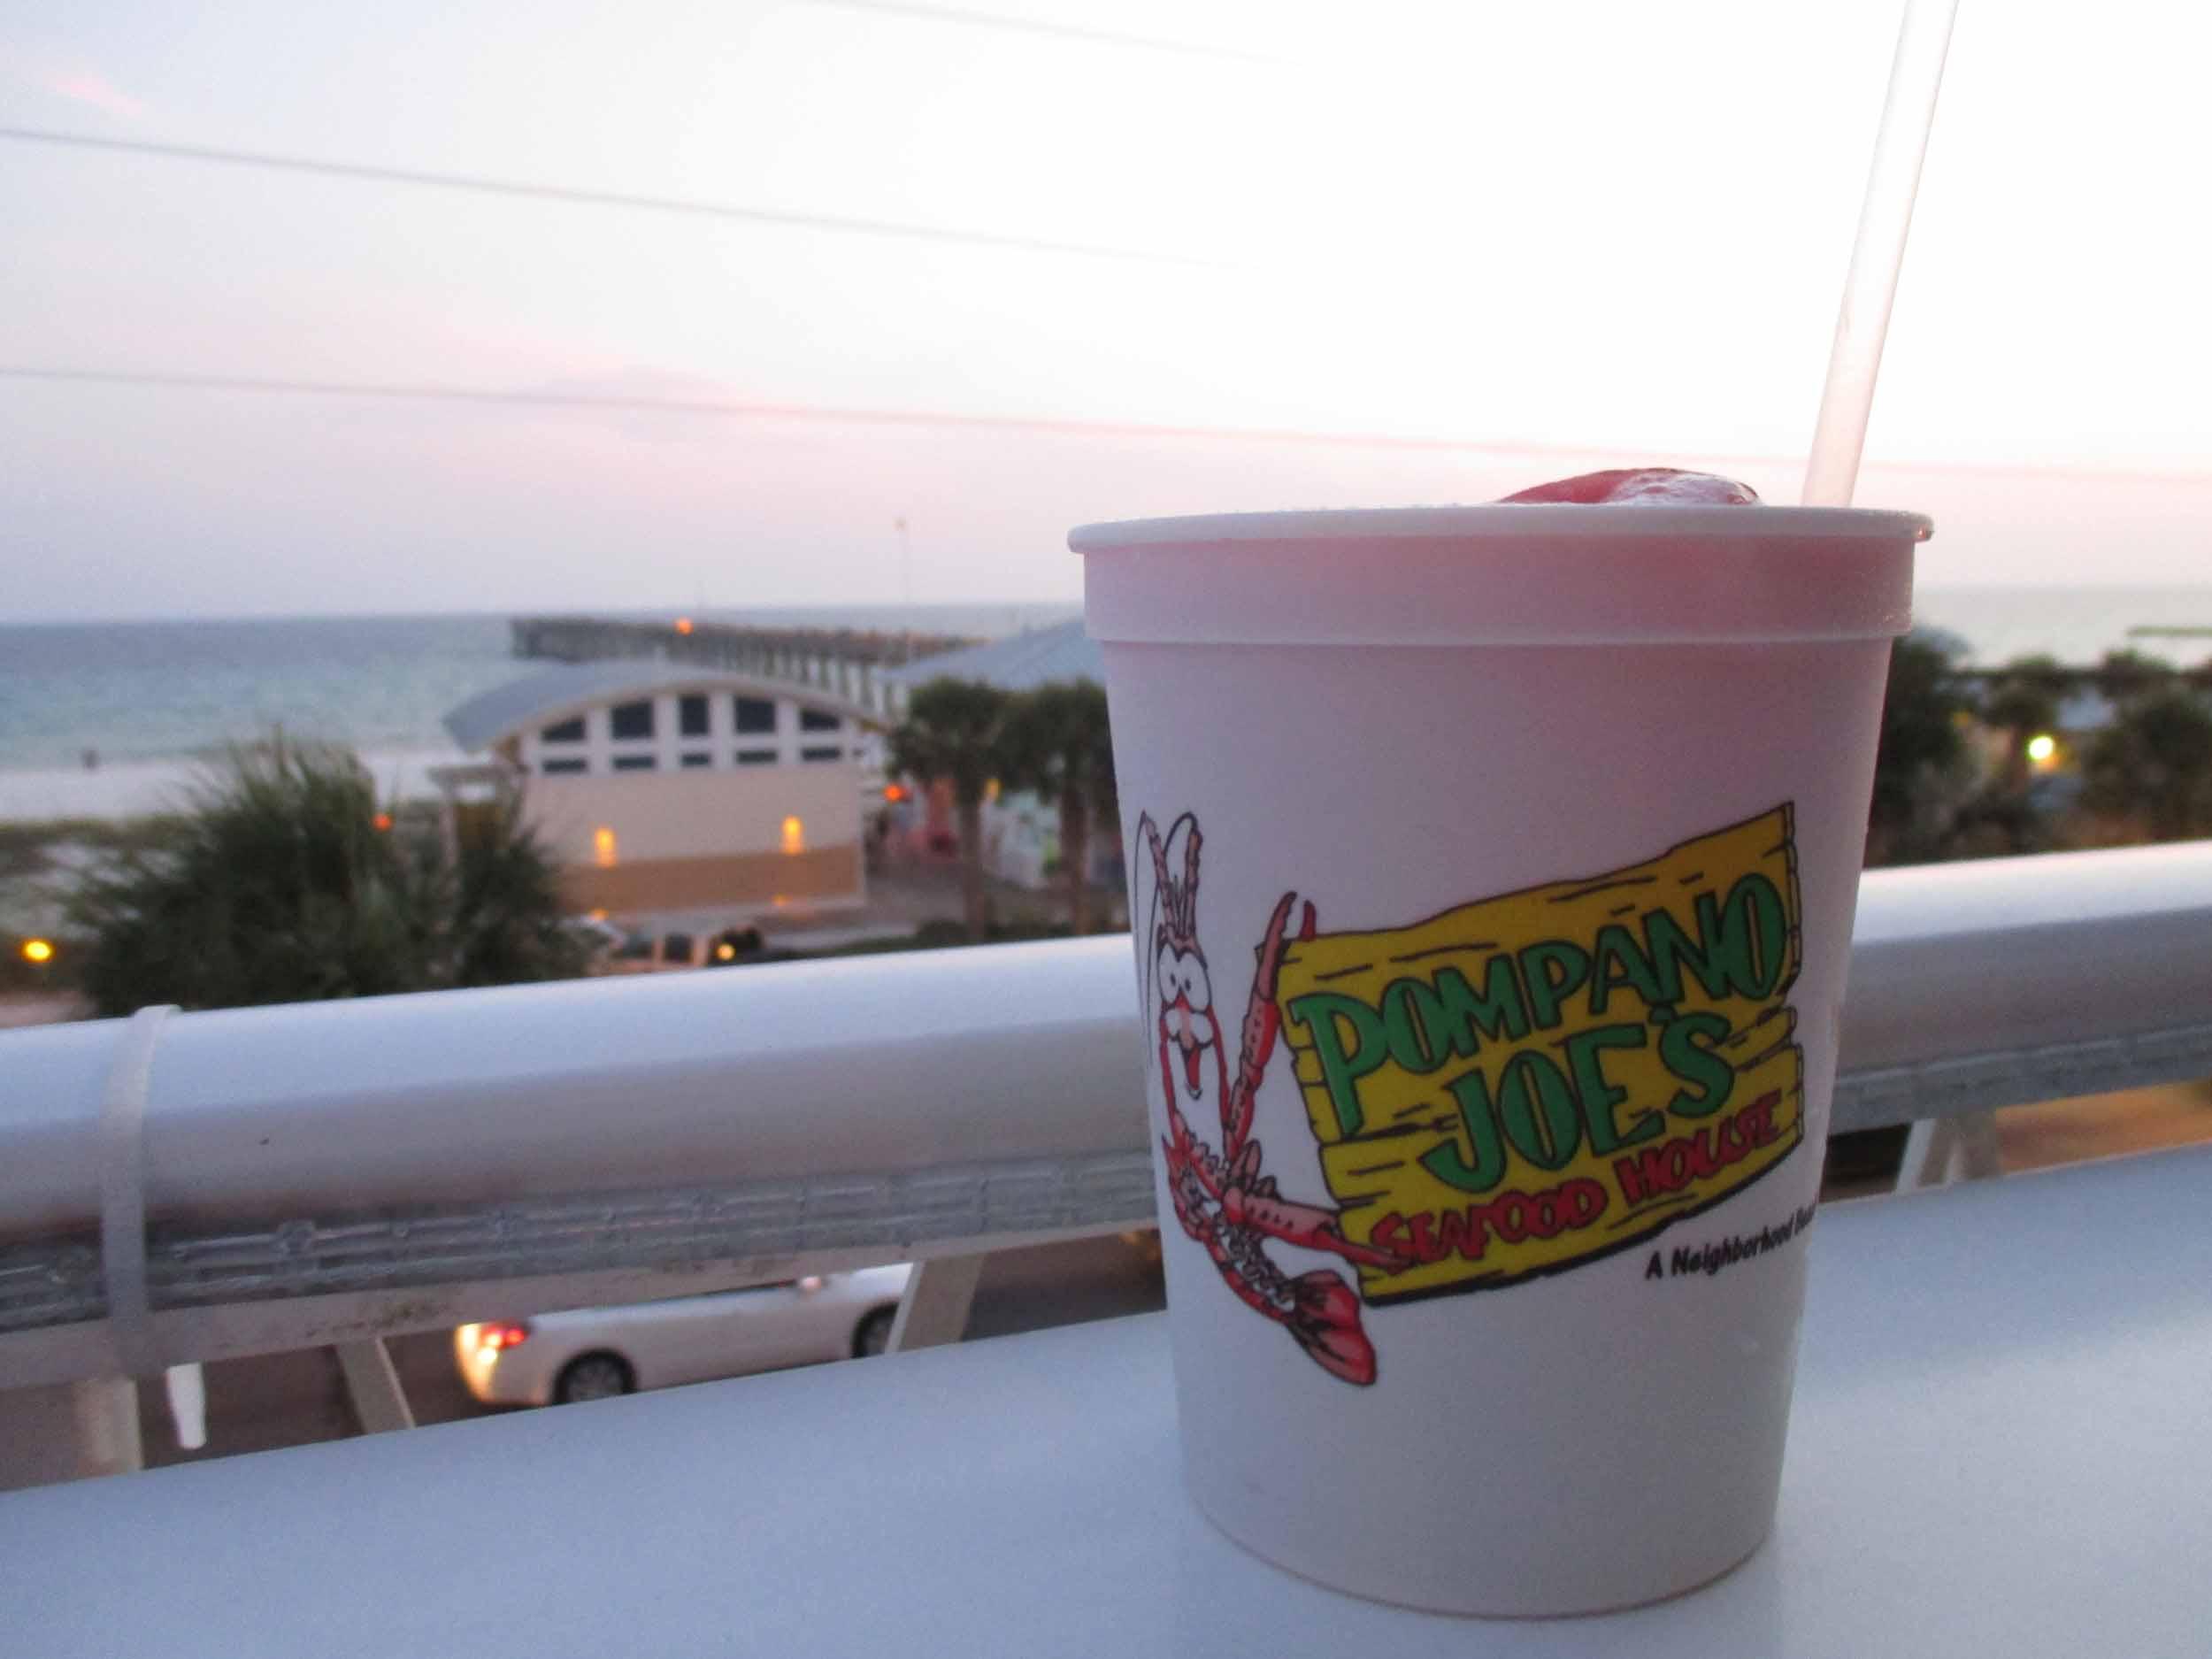 Pompano Joe's Tropical Drink